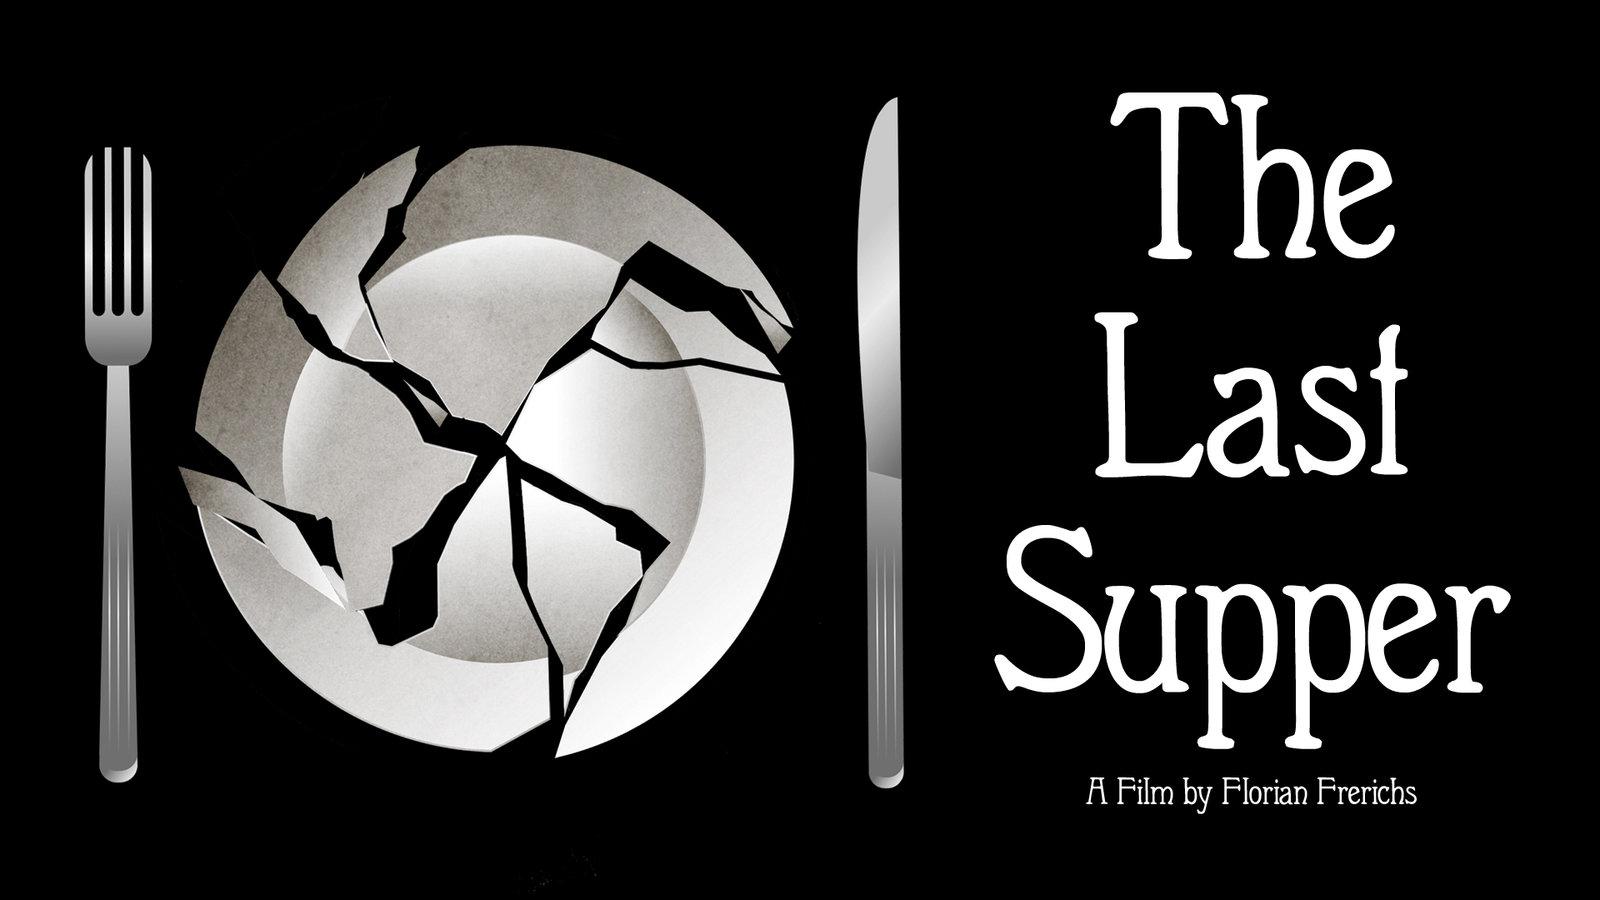 The Last Supper - Das letzte Mahl